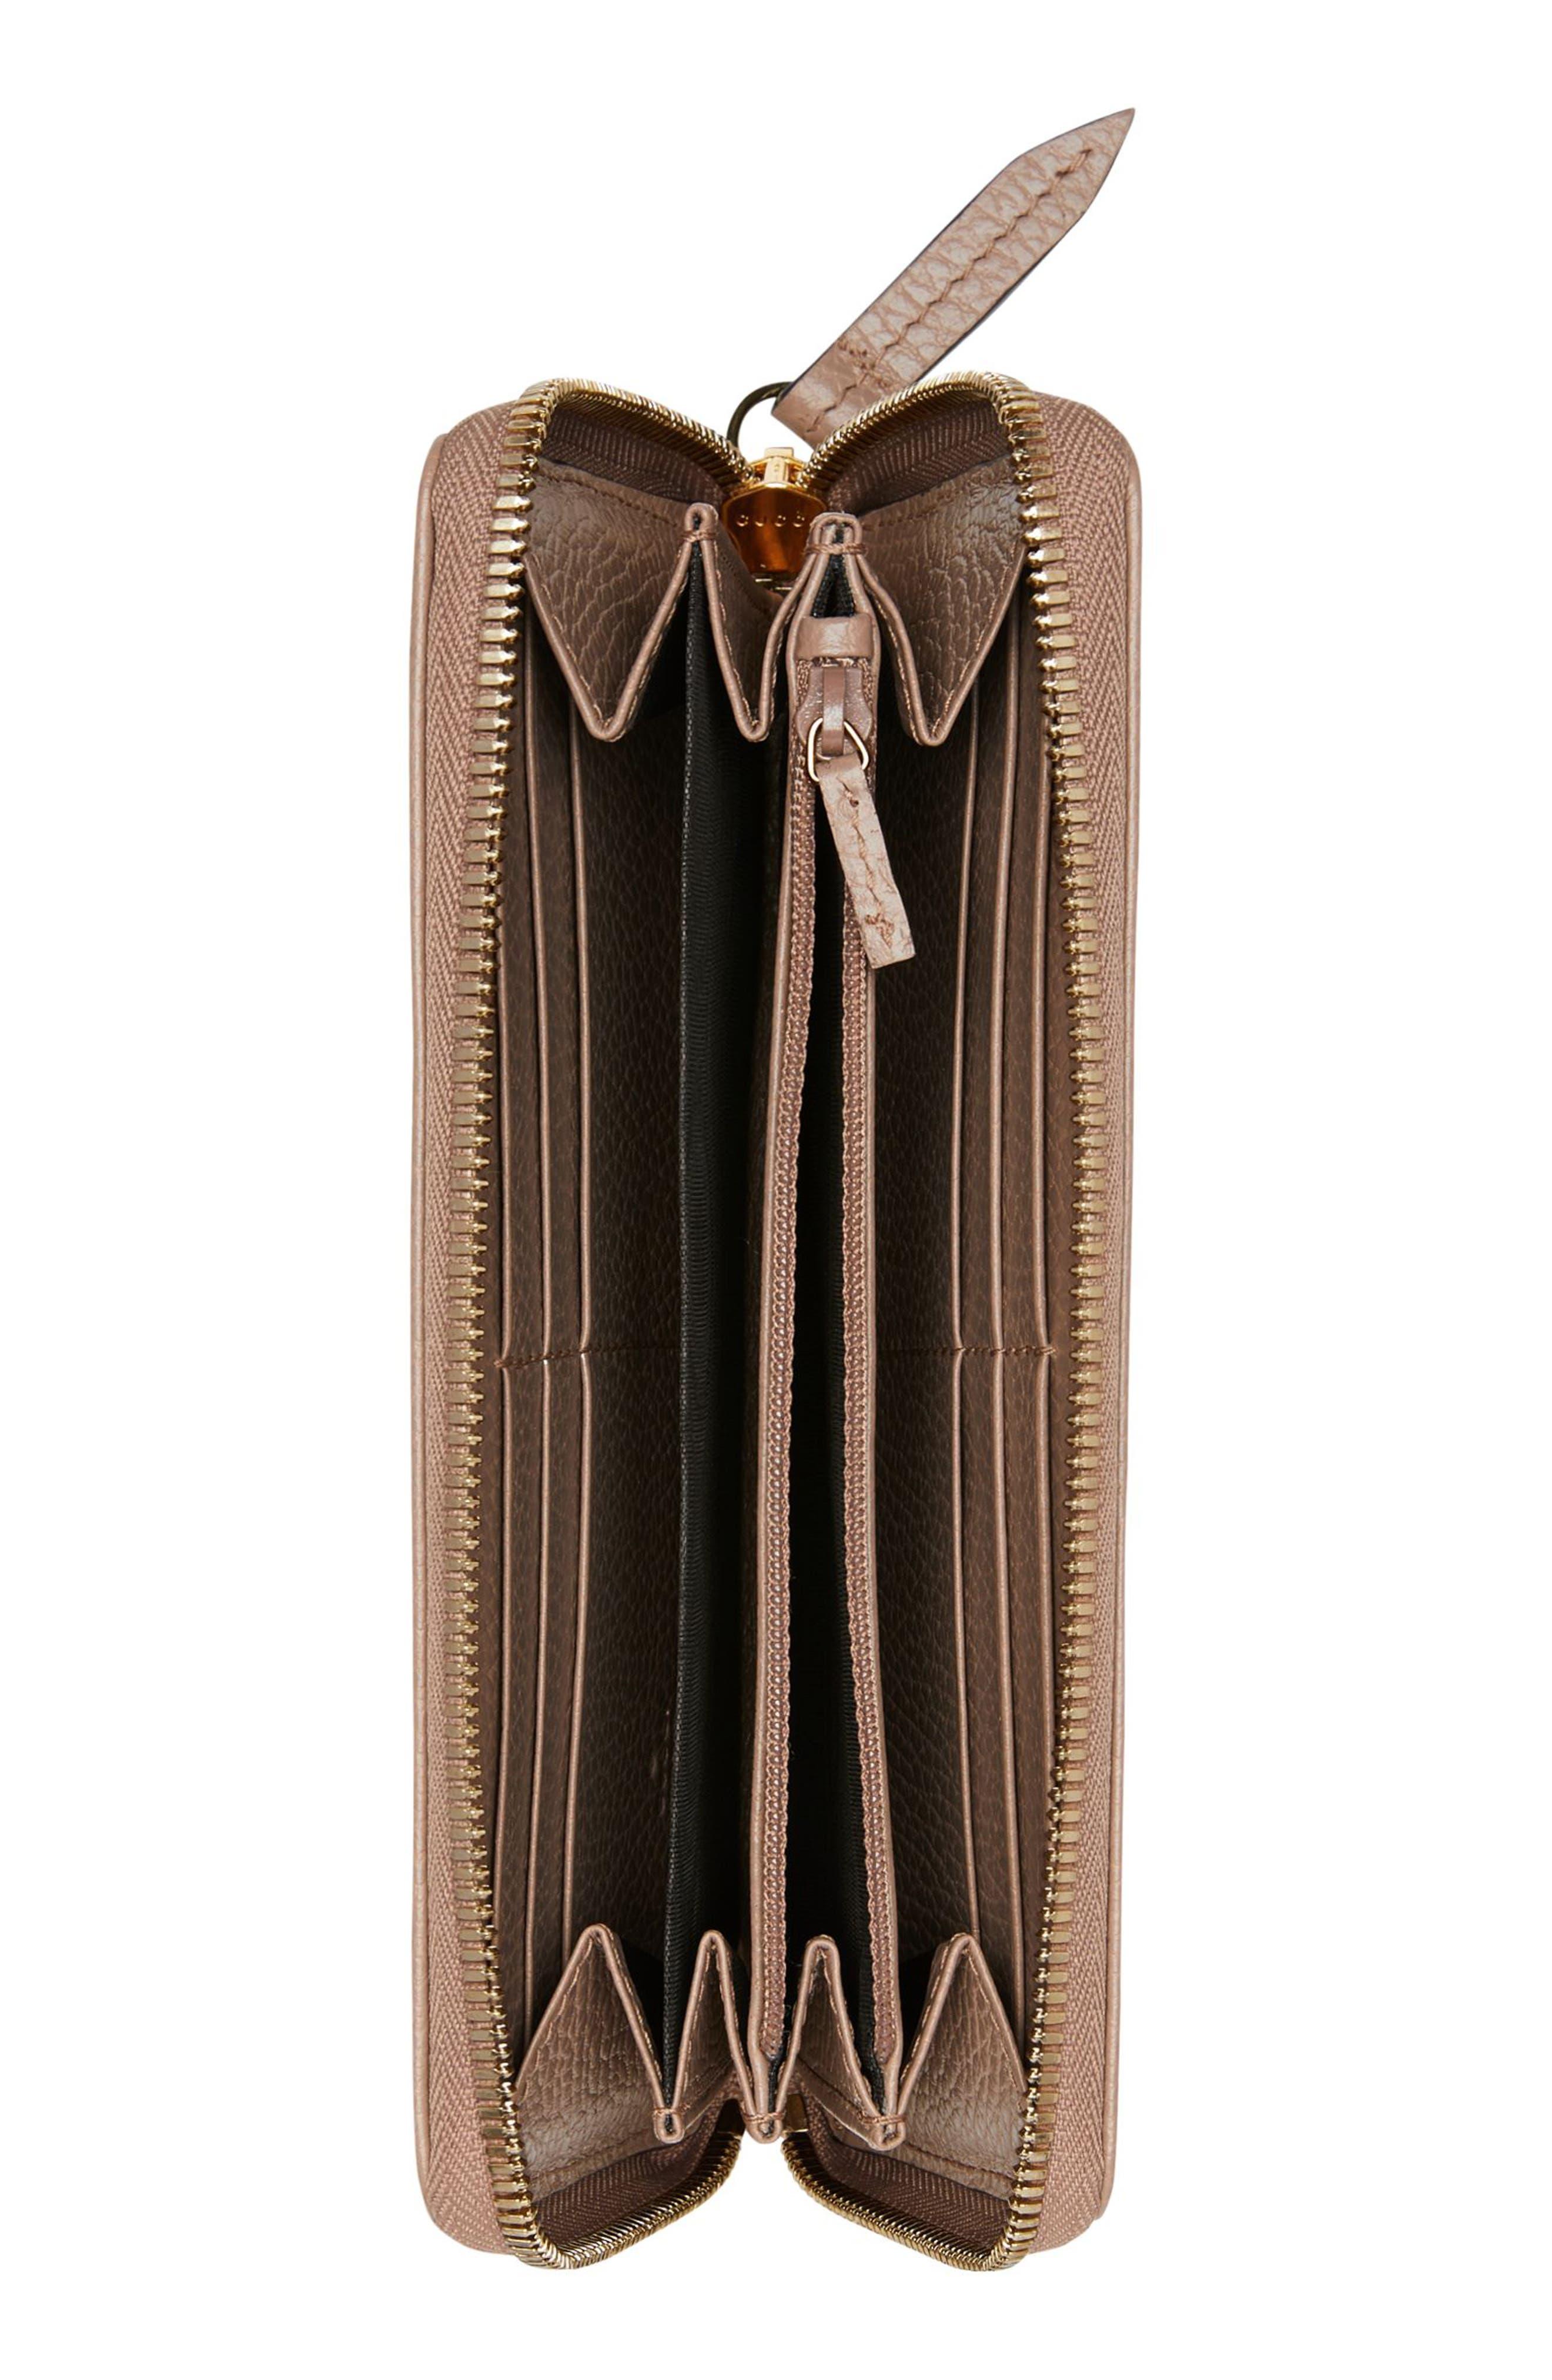 GUCCI, Petite Marmont Leather Zip Around Wallet, Alternate thumbnail 2, color, PORCELAIN ROSE